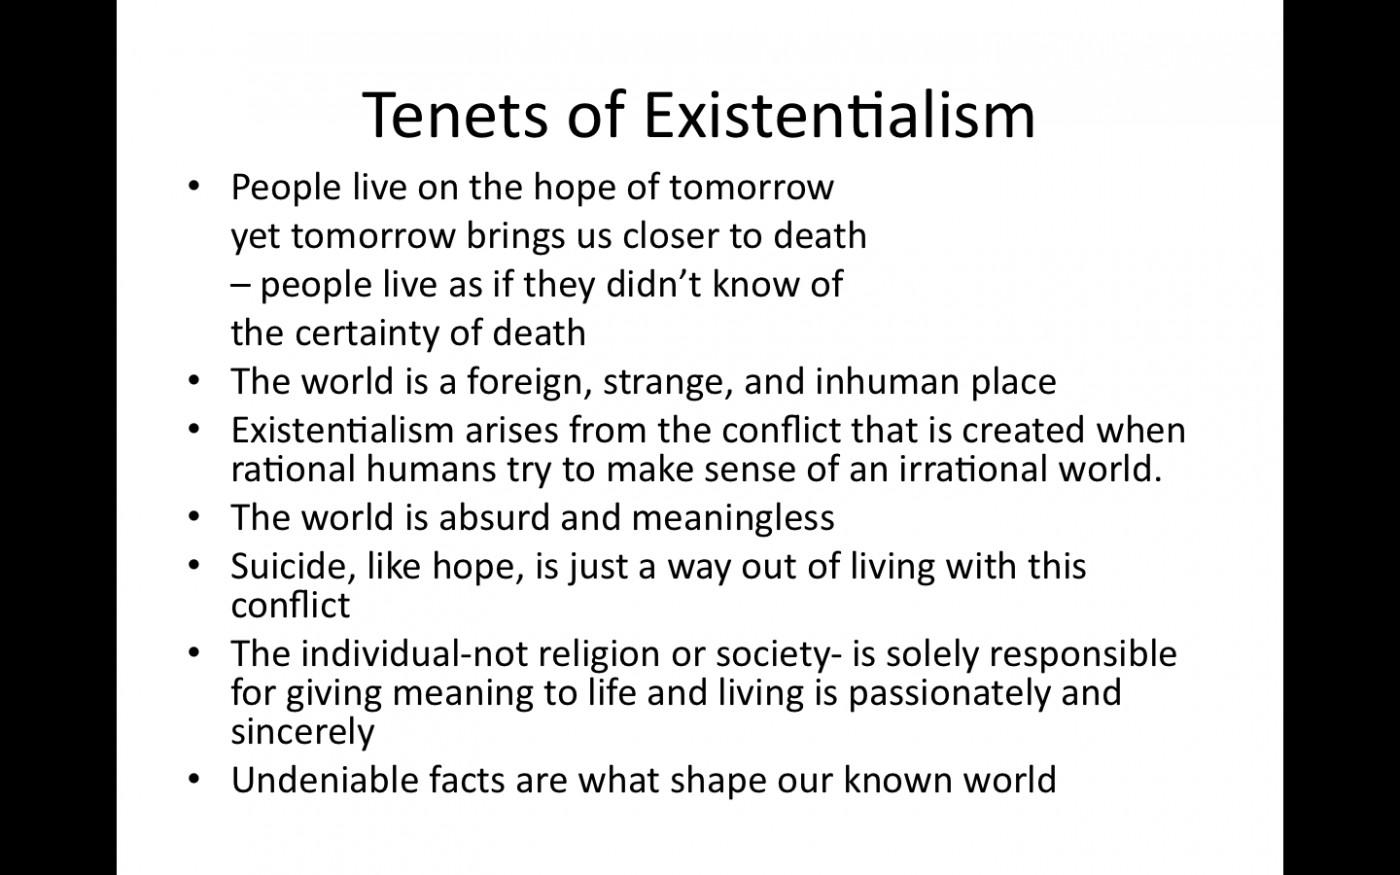 004 Essays In Existentialism Essay Example Tenets Of Outstanding Sartre Tumblr Clarke Lexa 1400